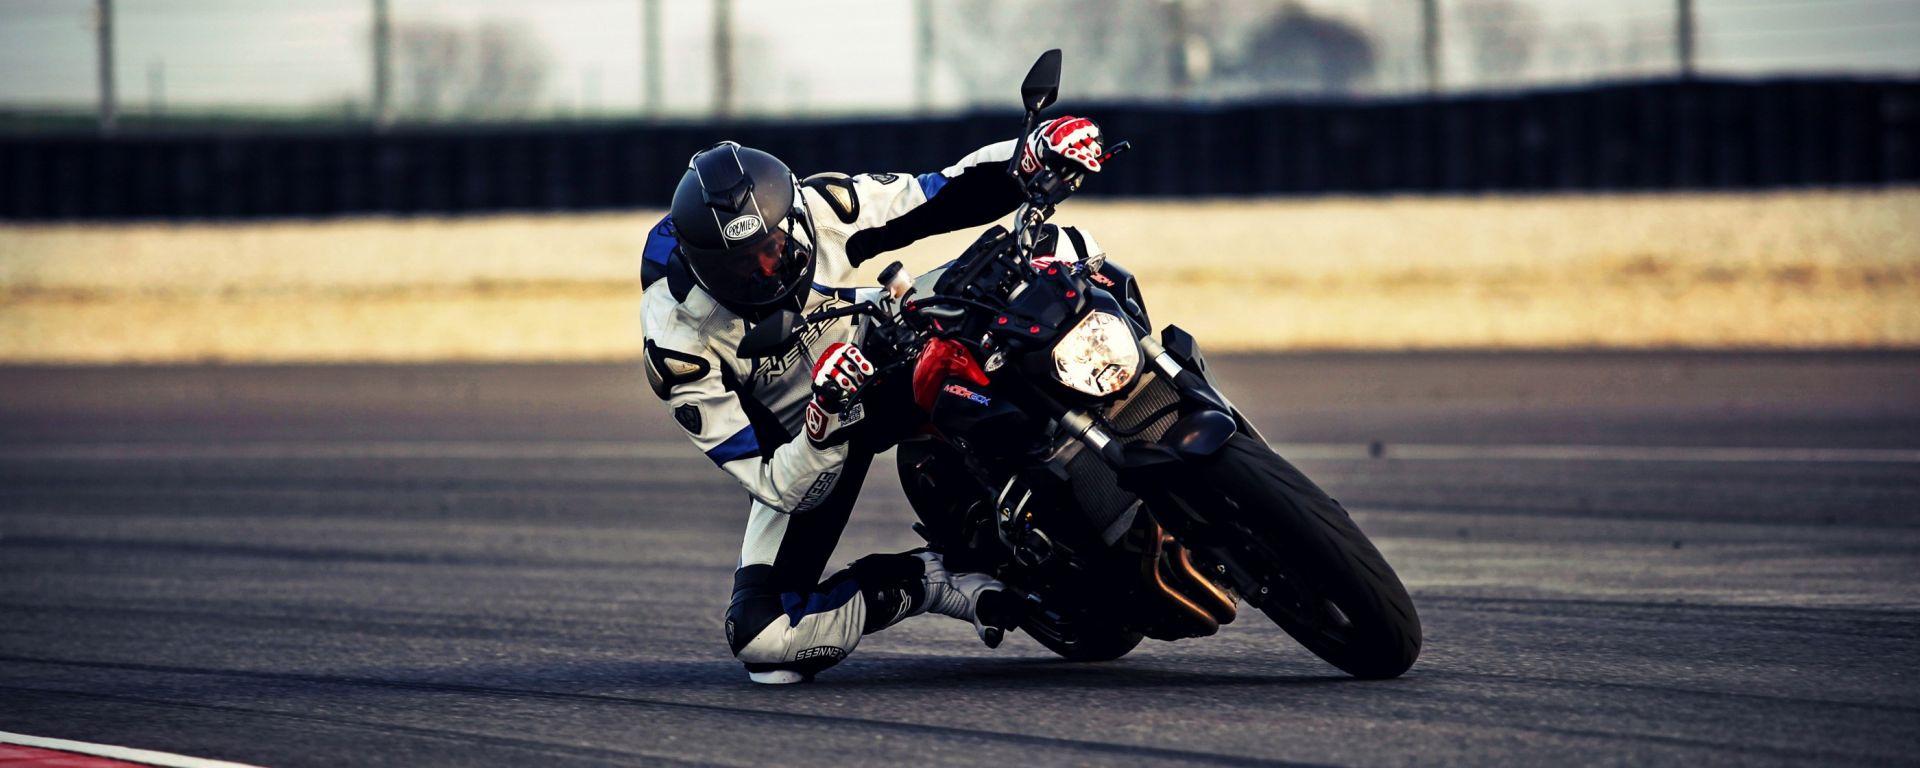 Yamaha MT-07, la prova in pista